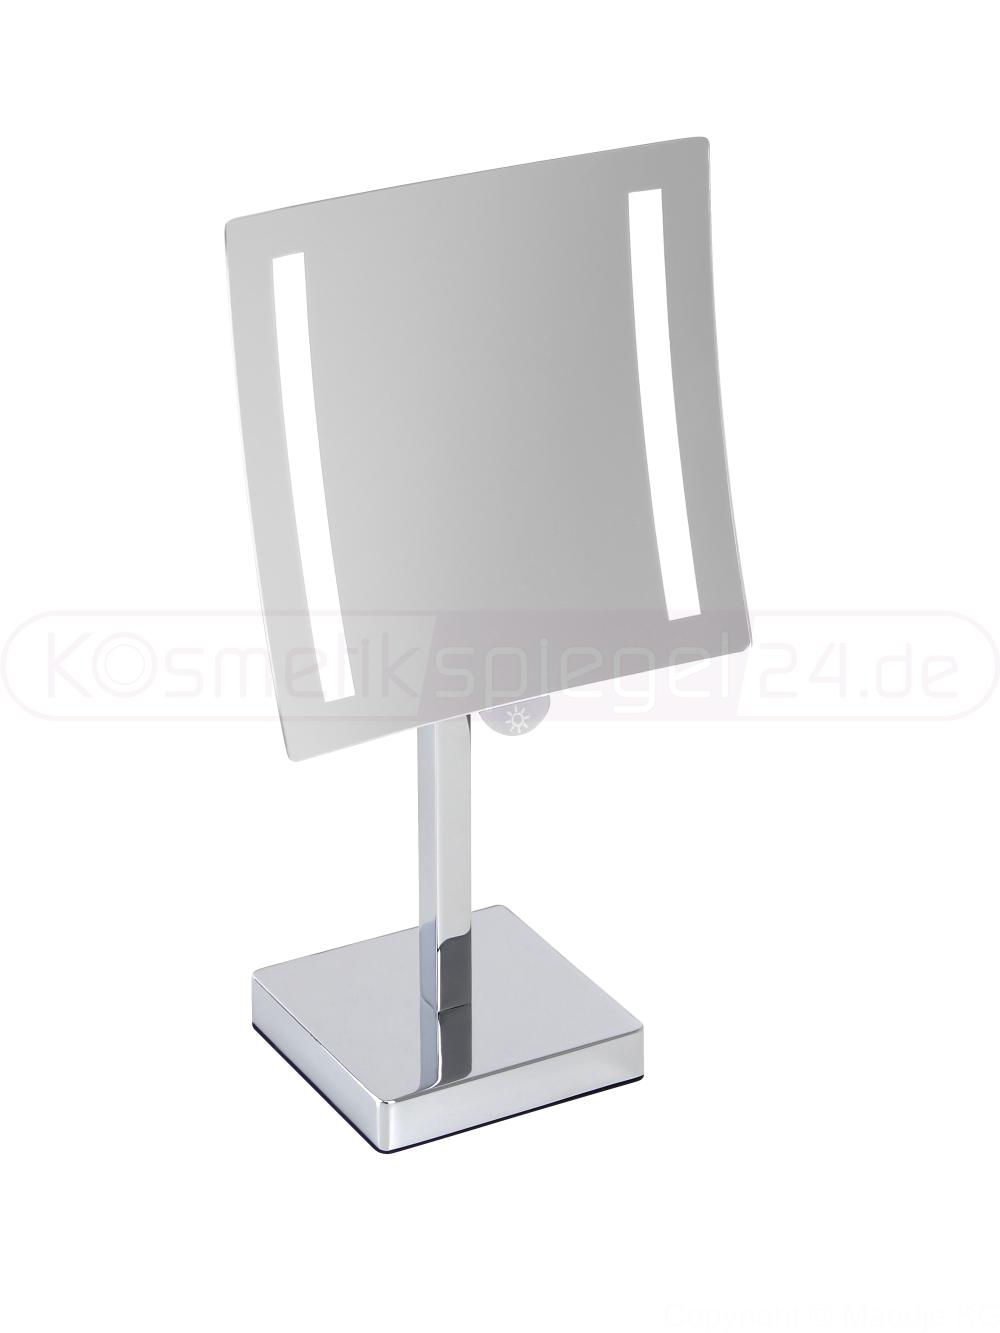 kosmetikspiegel online kaufen maedje kg deusenfeld sl544b led stand kosmetikspiegel. Black Bedroom Furniture Sets. Home Design Ideas